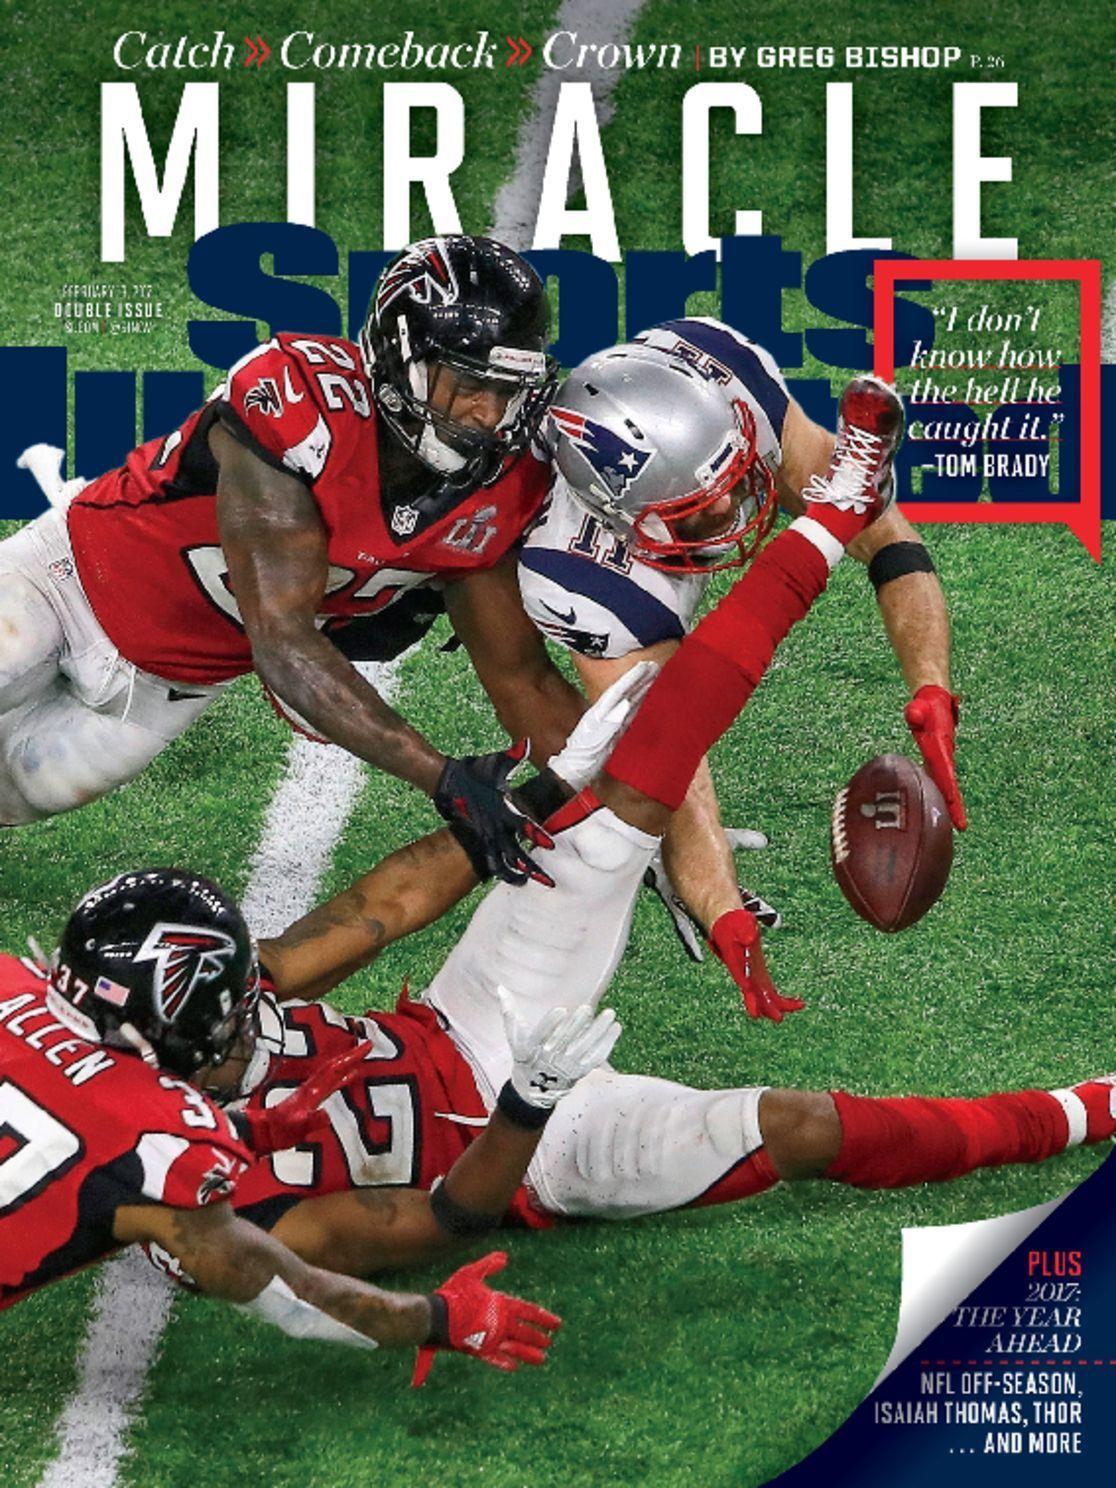 Sports Illustrated Magazine Subscription New England Patriots New England Patriots Football Sports Illustrated 2017